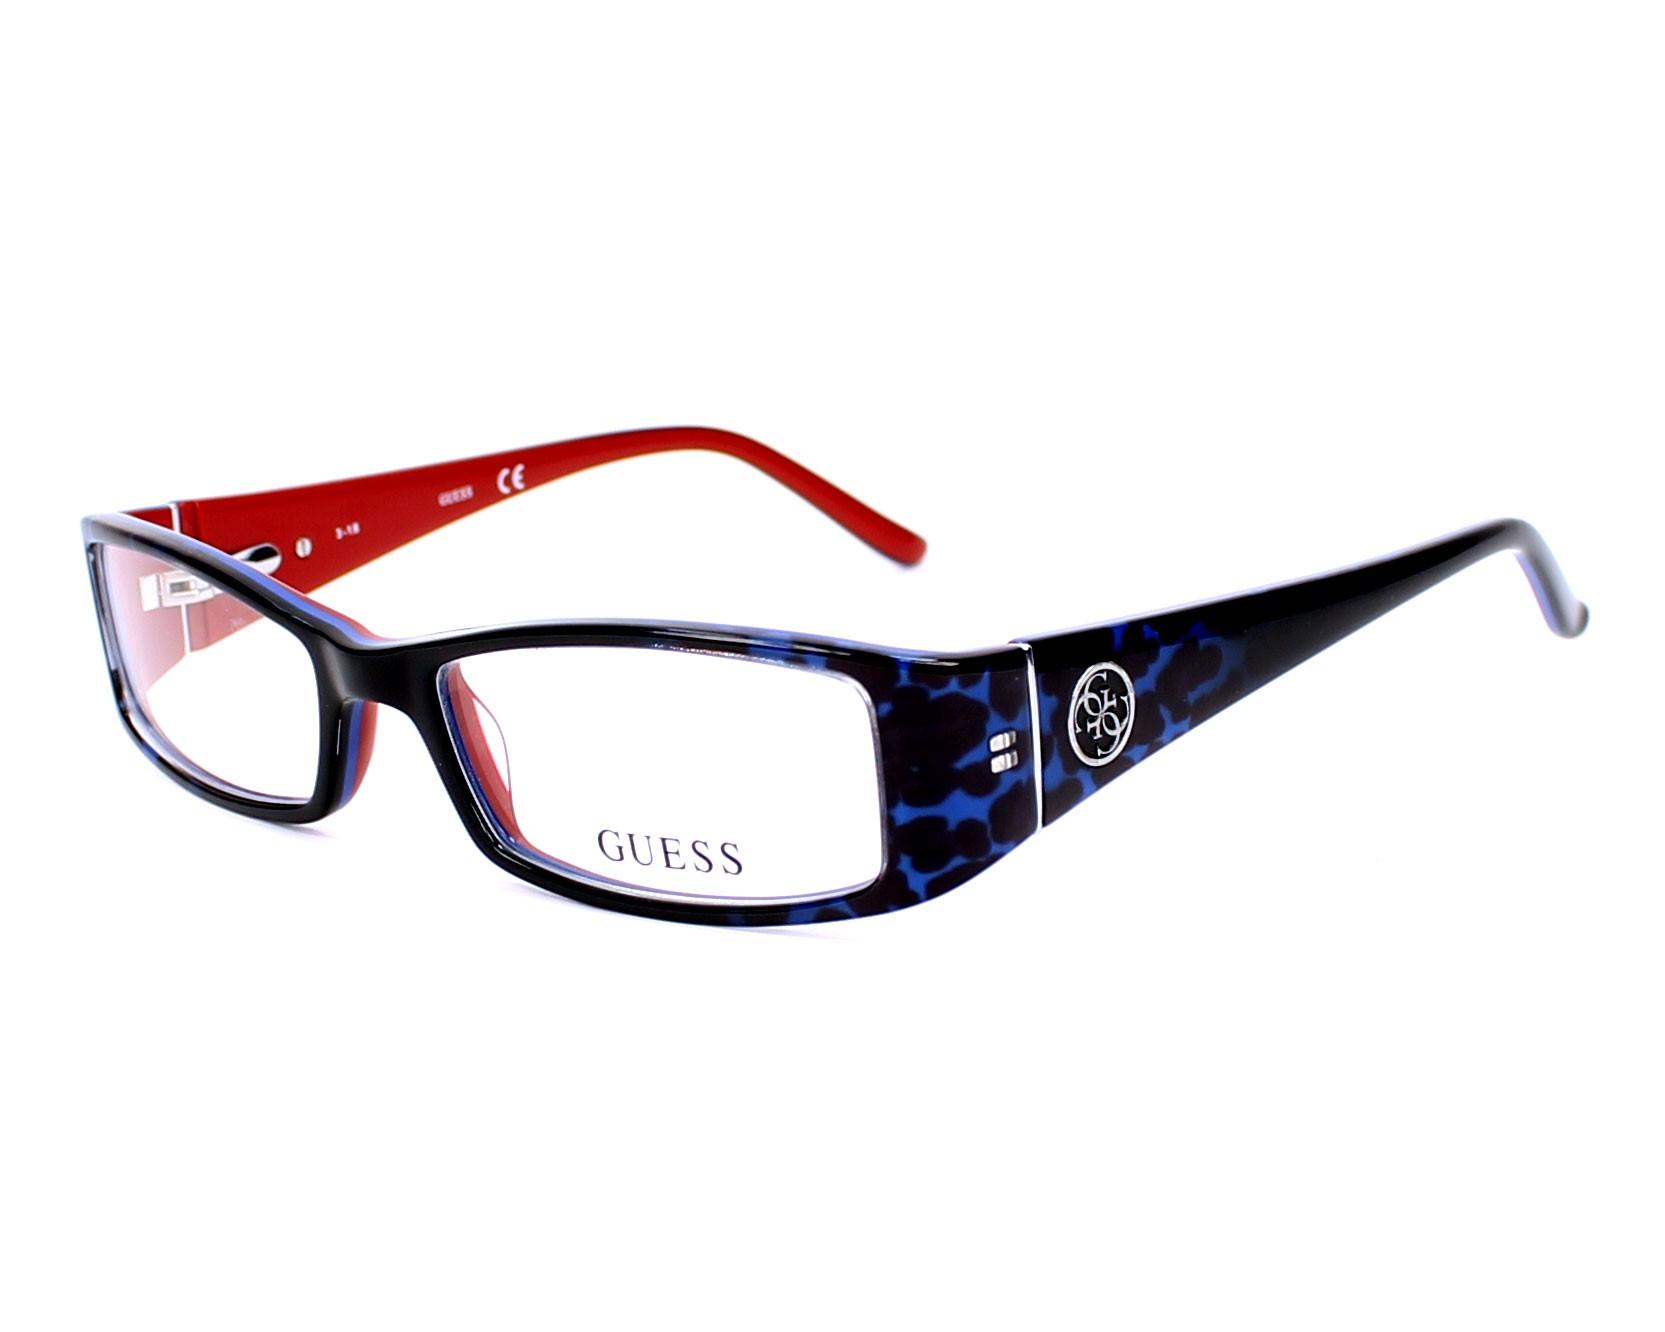 Guess Eyeglasses Black GU-2537 092 - Visionet US